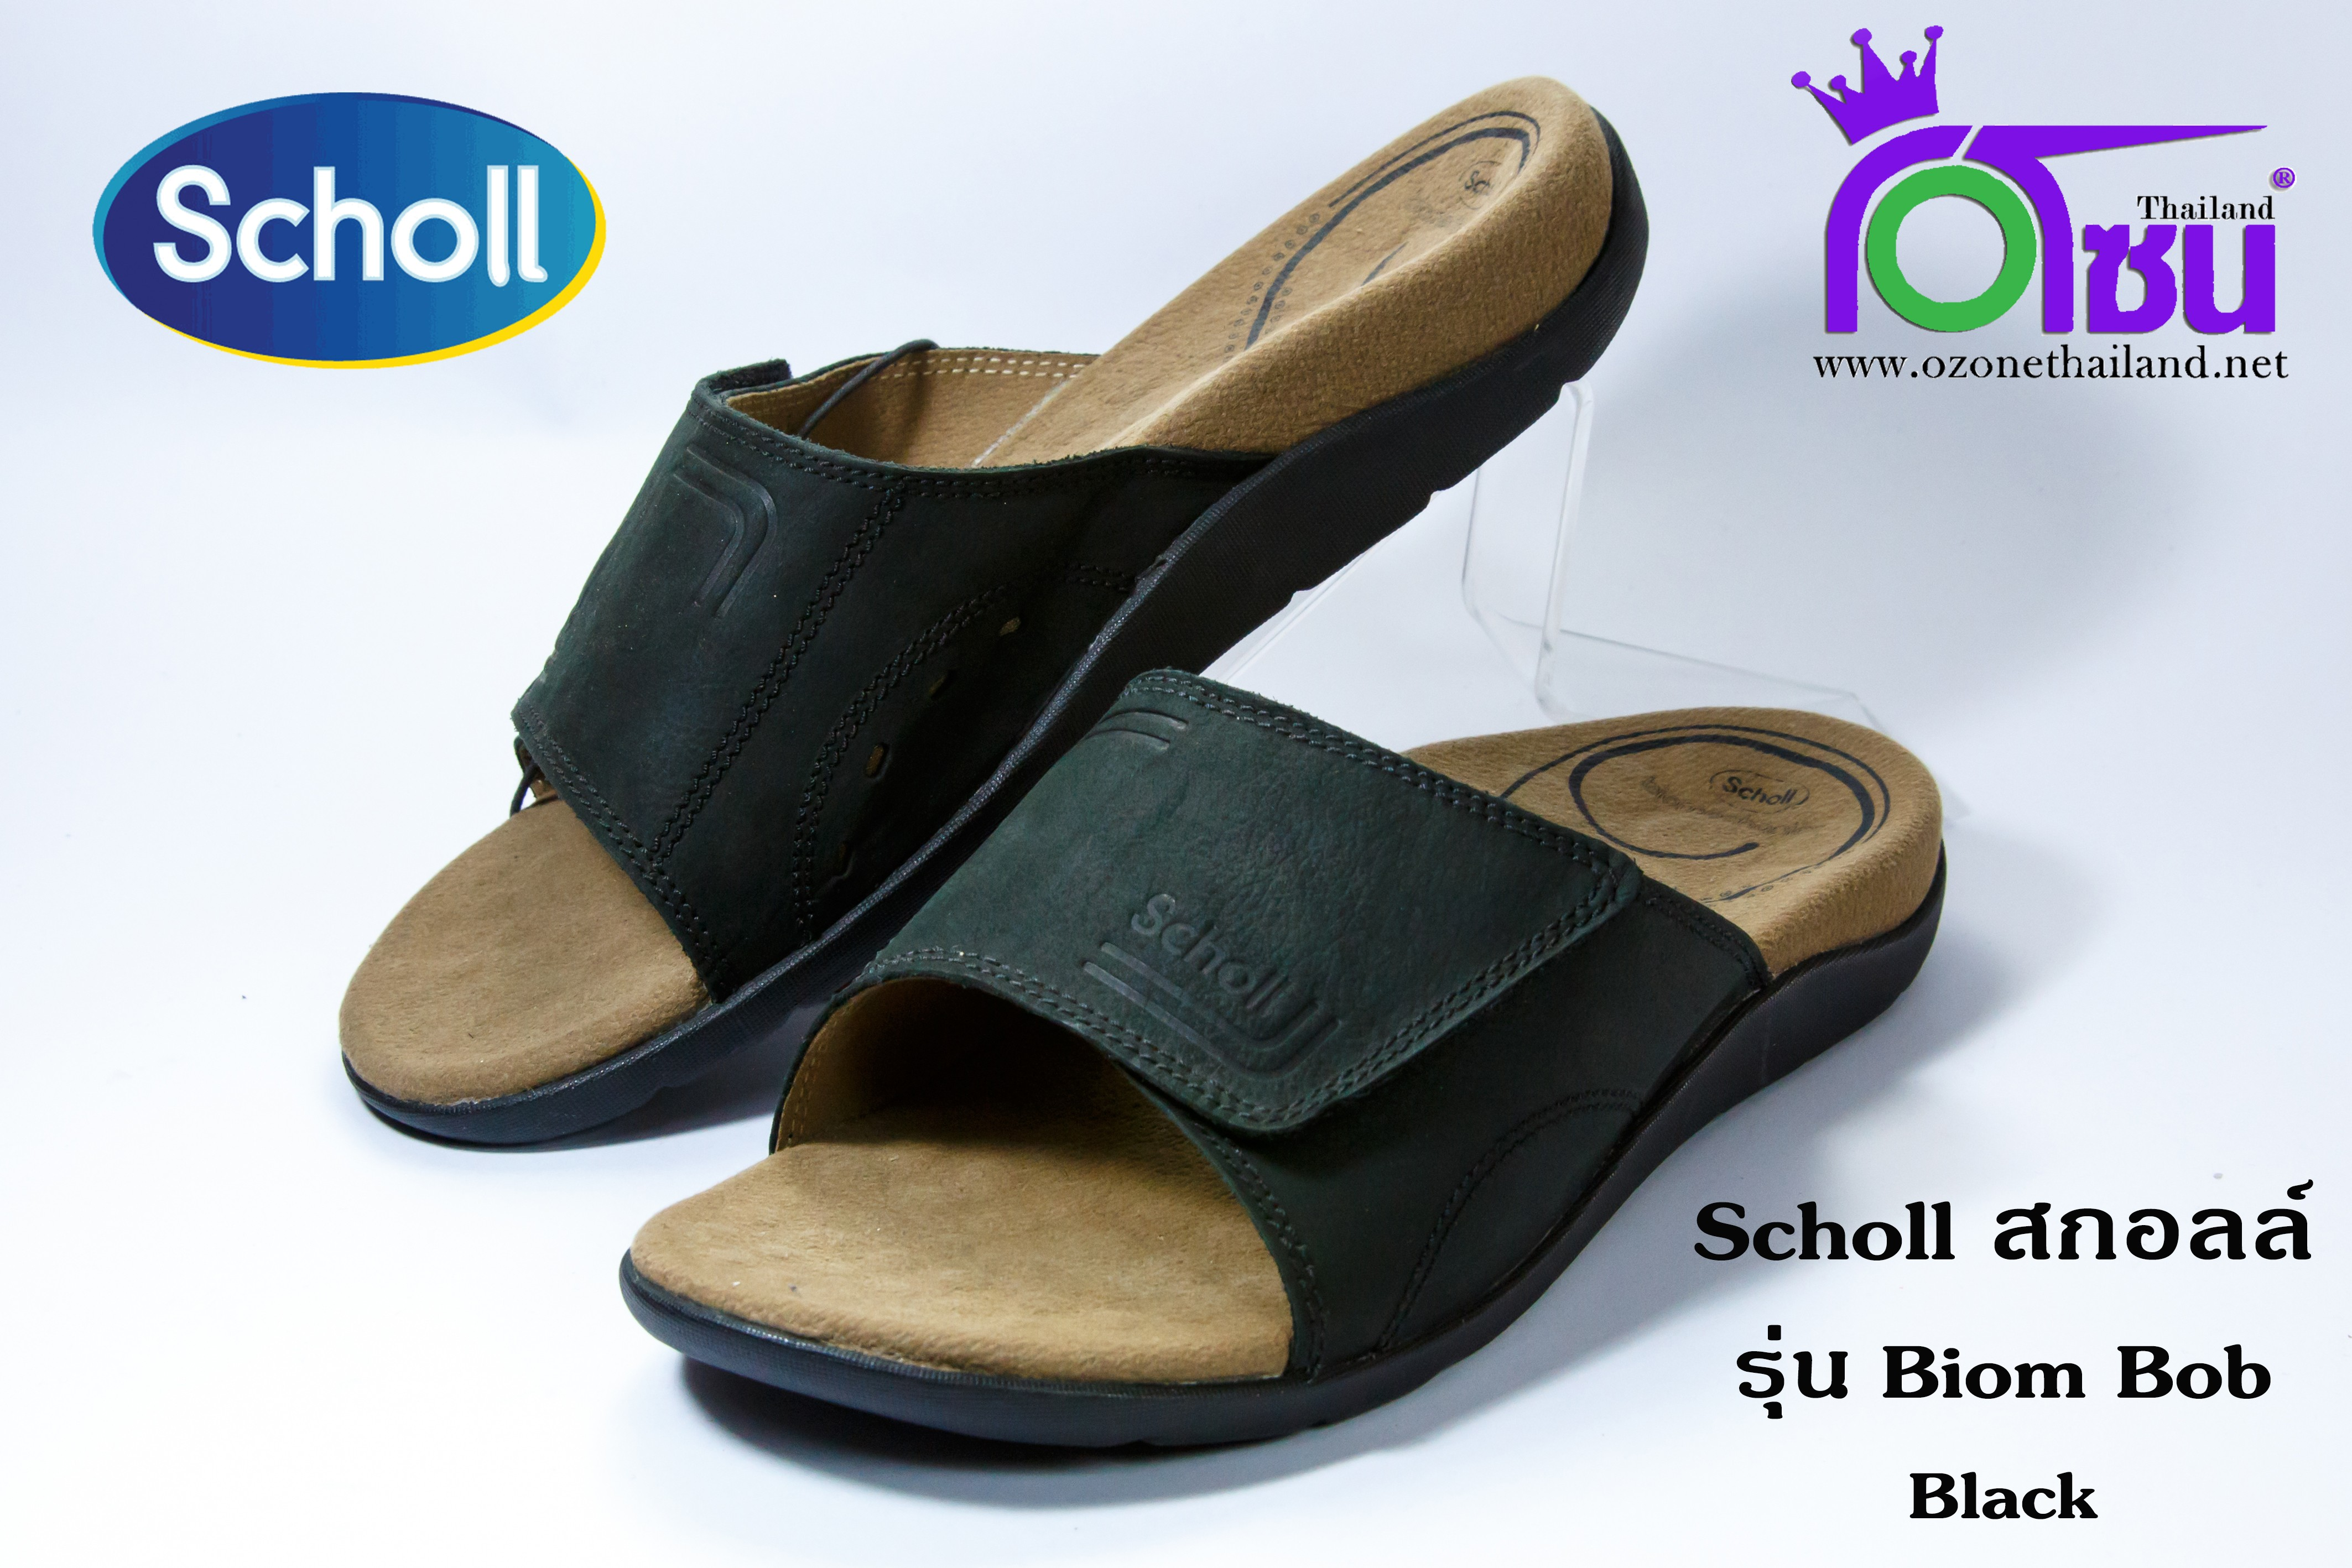 Scholl Biom Bob (รุ่น ไบโอม บ๊อบ) สีดำ เบอร์ 6-9